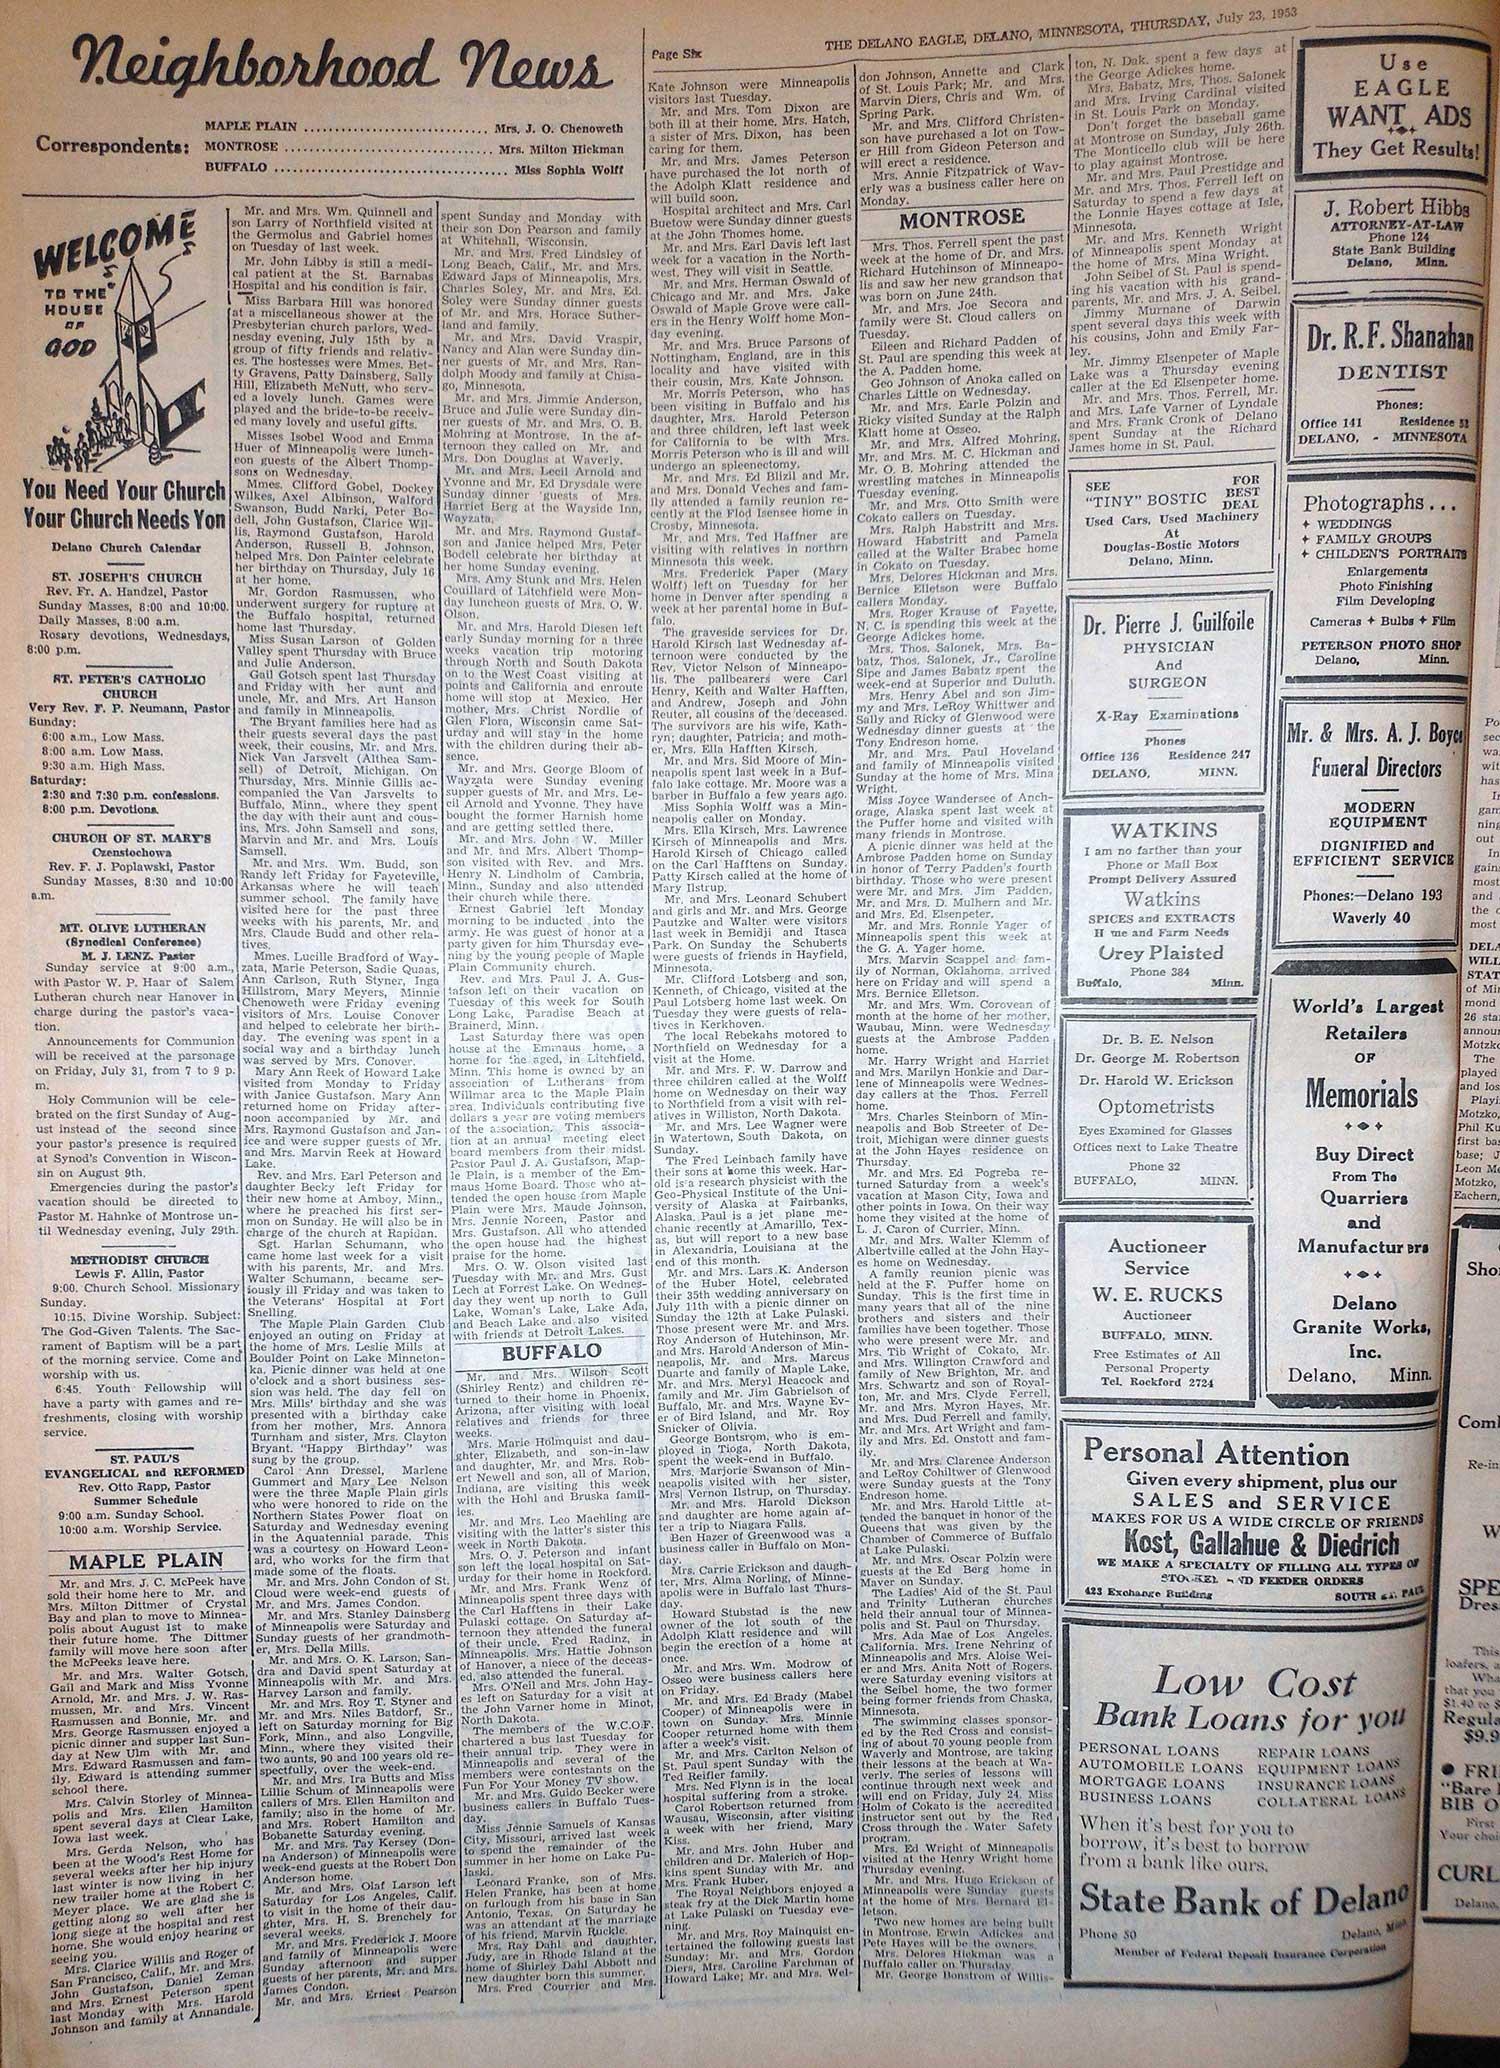 7/23/1953, p6